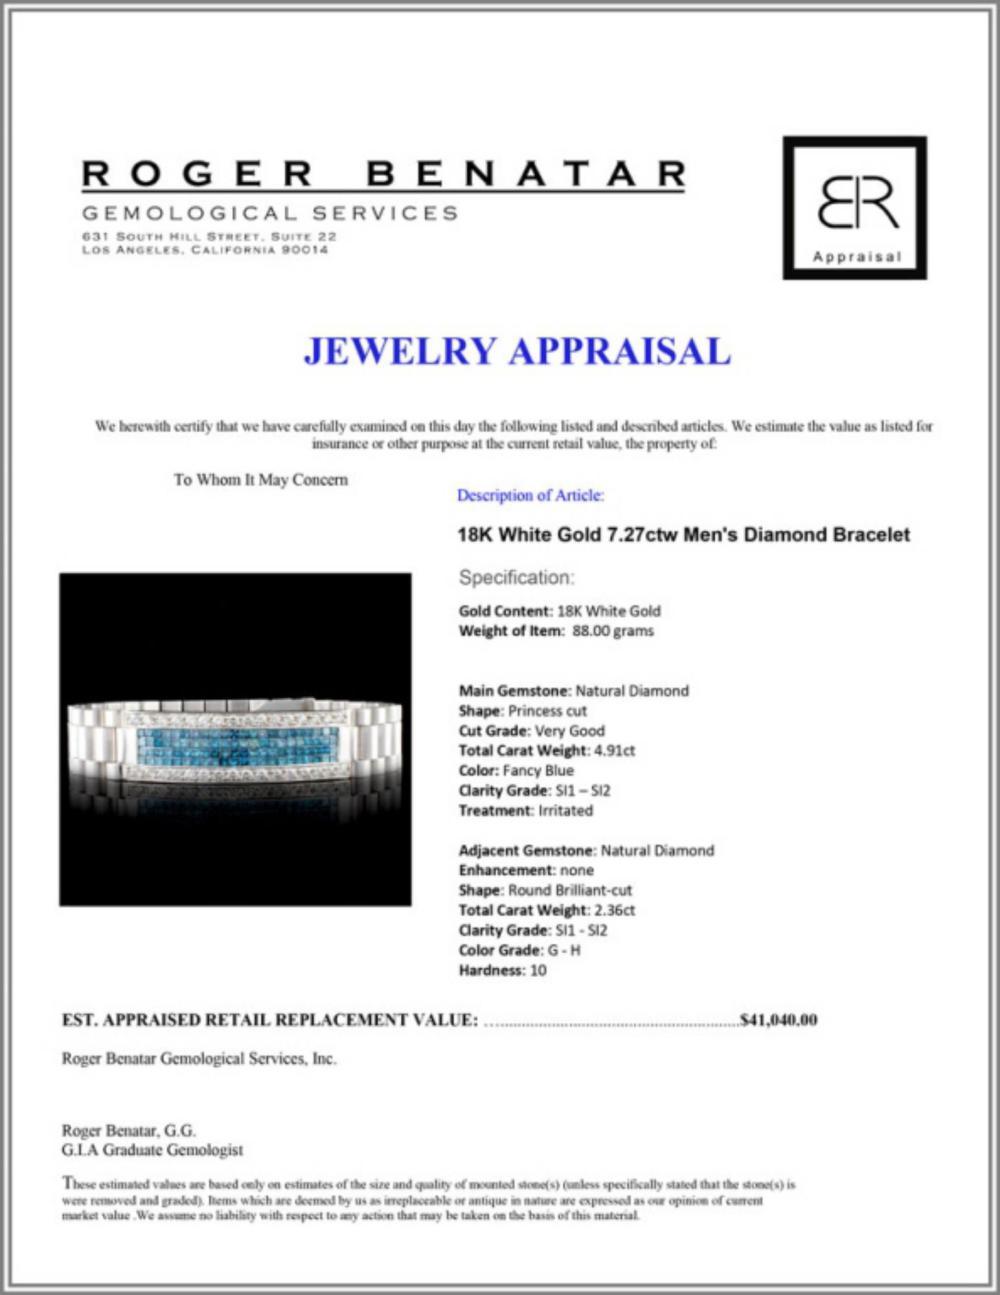 Lot 45: 18K Gold 7.27ctw Men's Diamond Bracelet